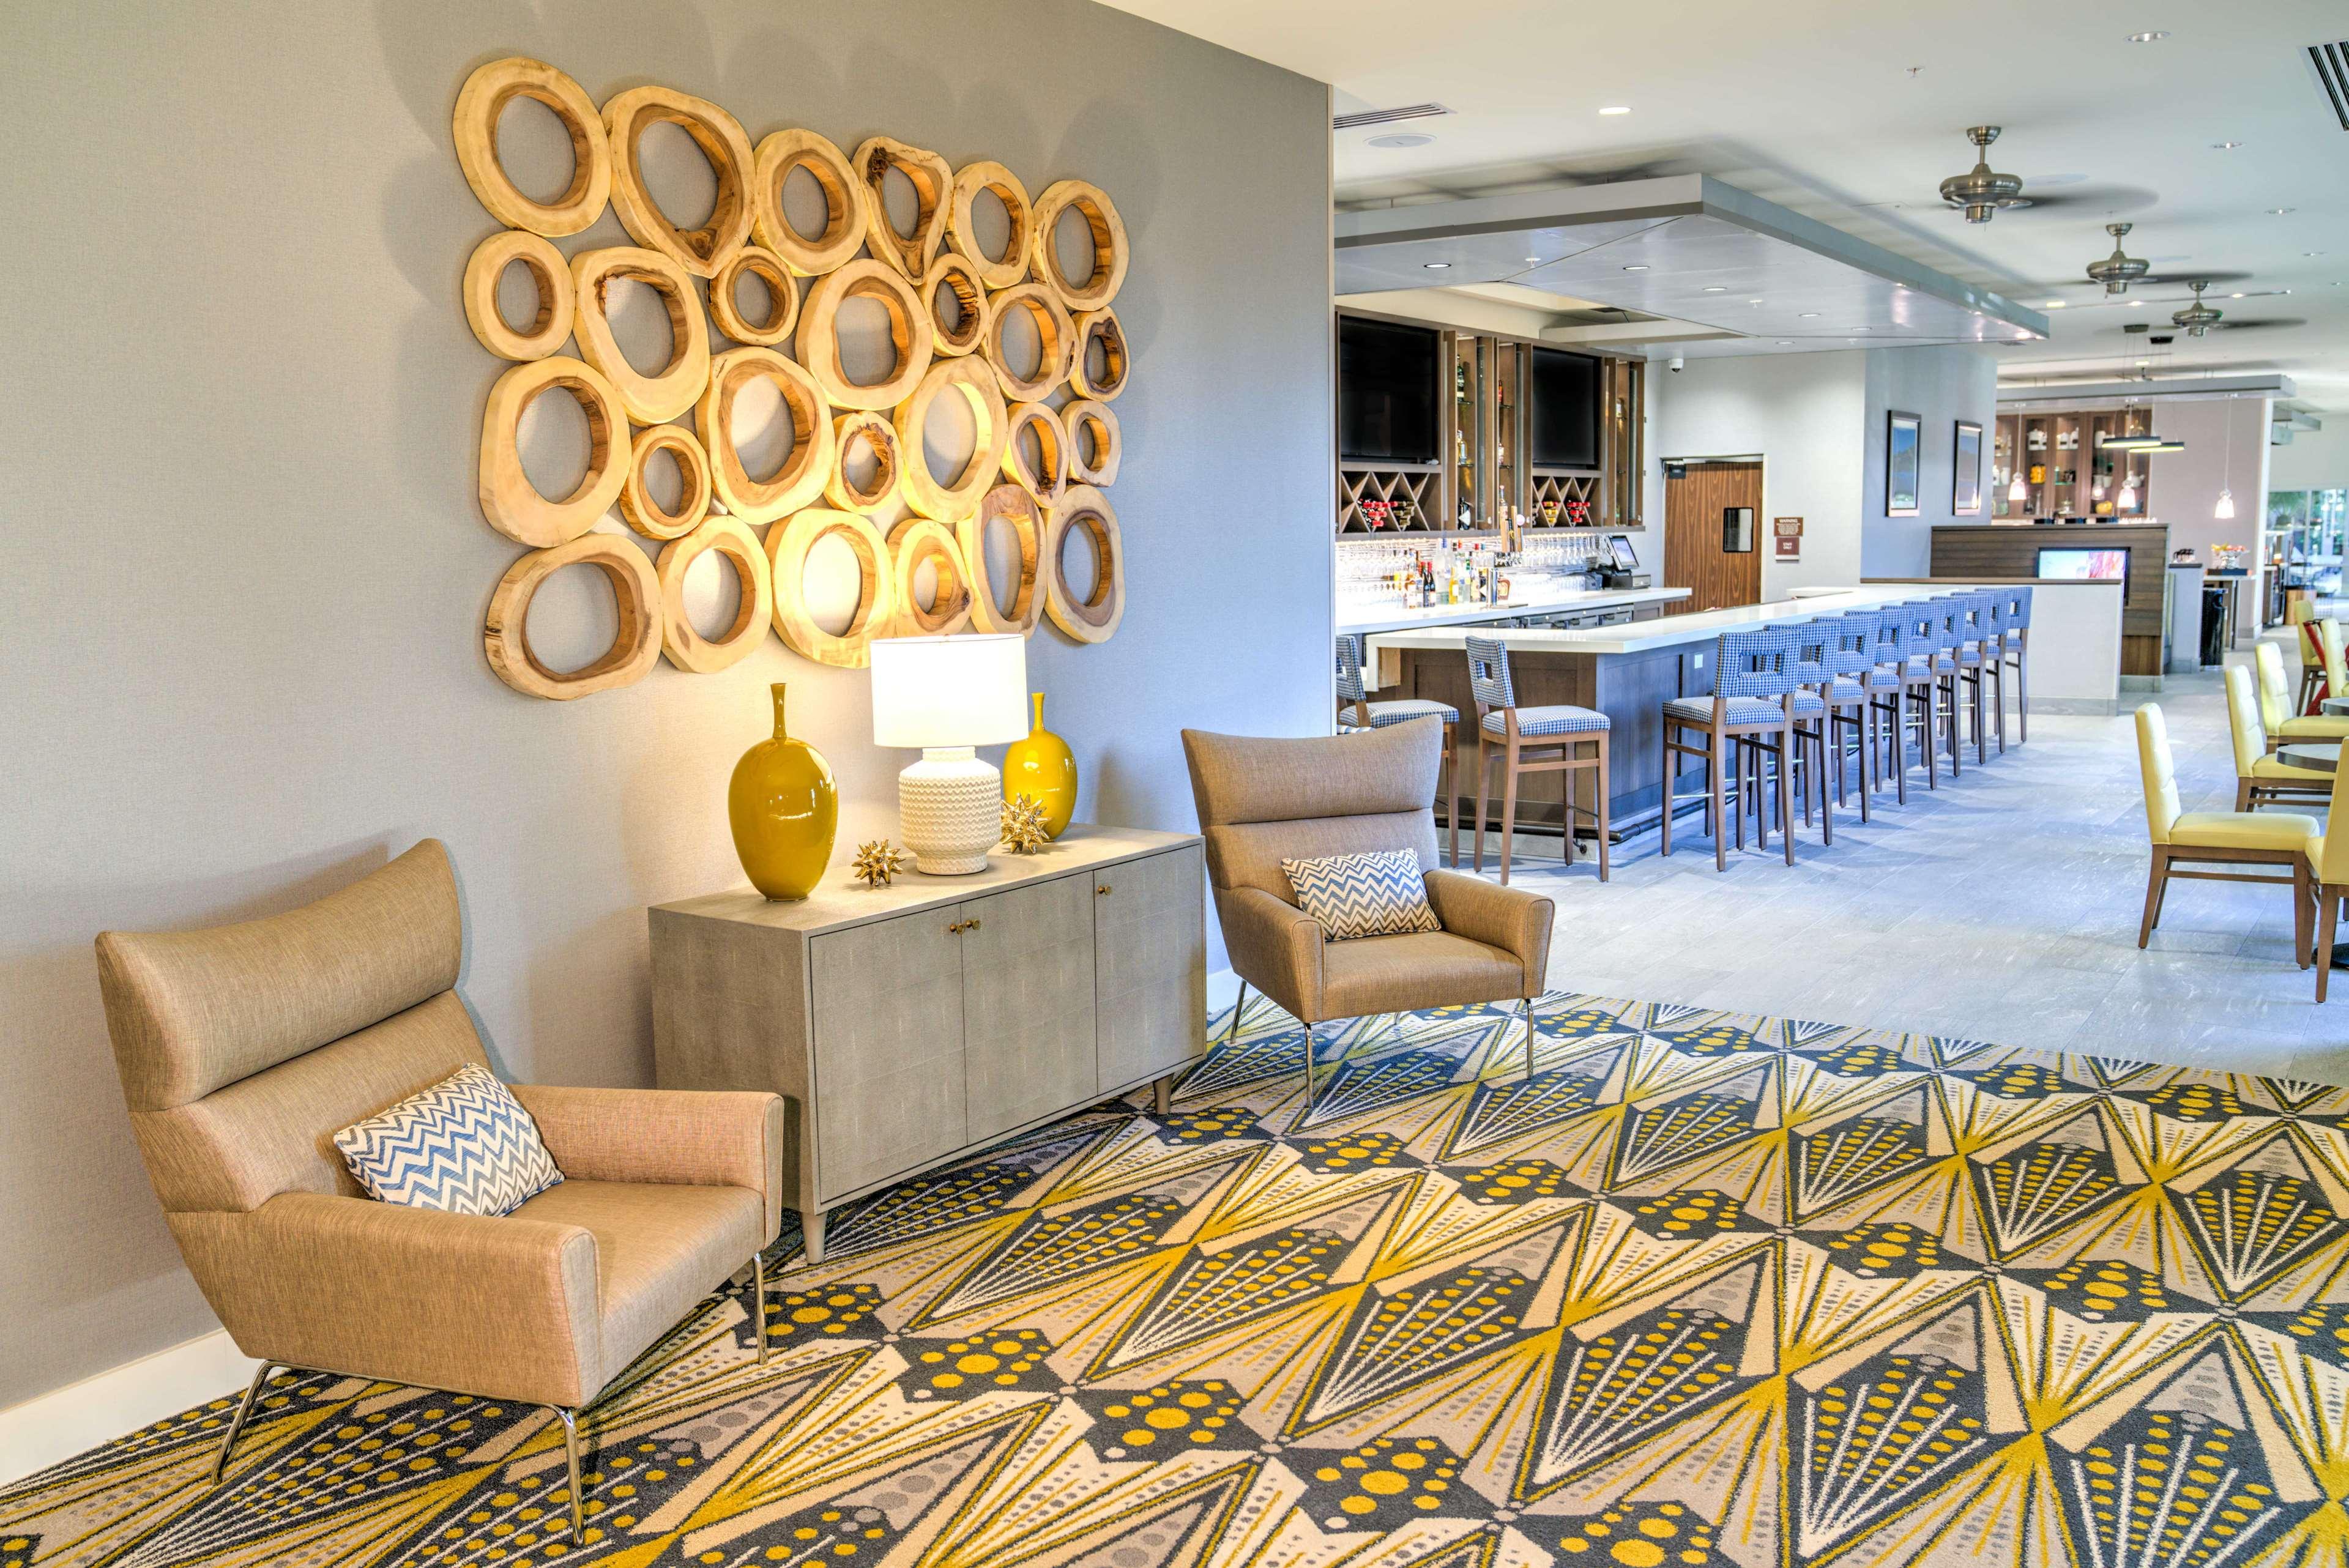 Hilton Garden Inn Santa Barbara/Goleta image 47